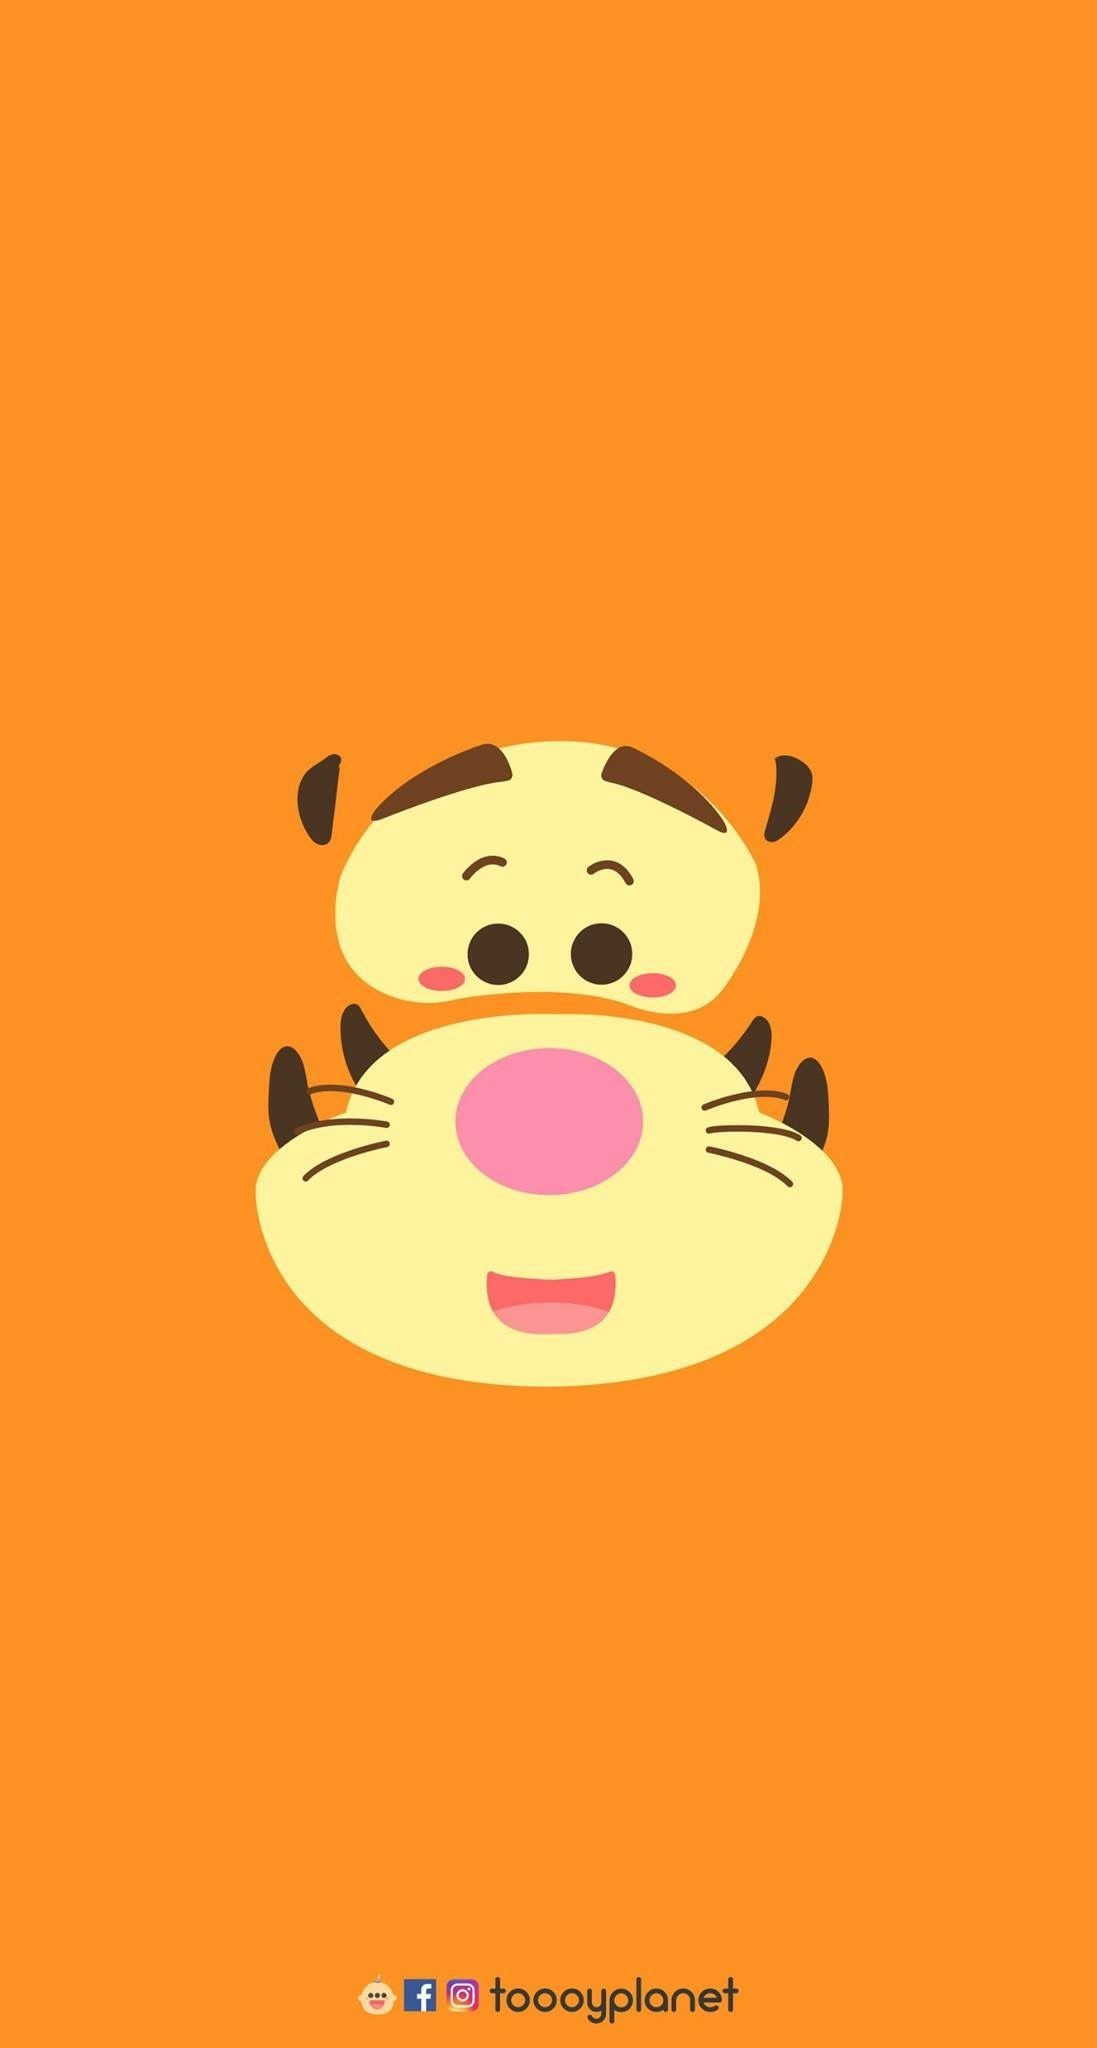 1097x2048, Pooh Bear, Tigger, Painting, Winnie The - Cartoon Animated Wallpaper Hd - HD Wallpaper